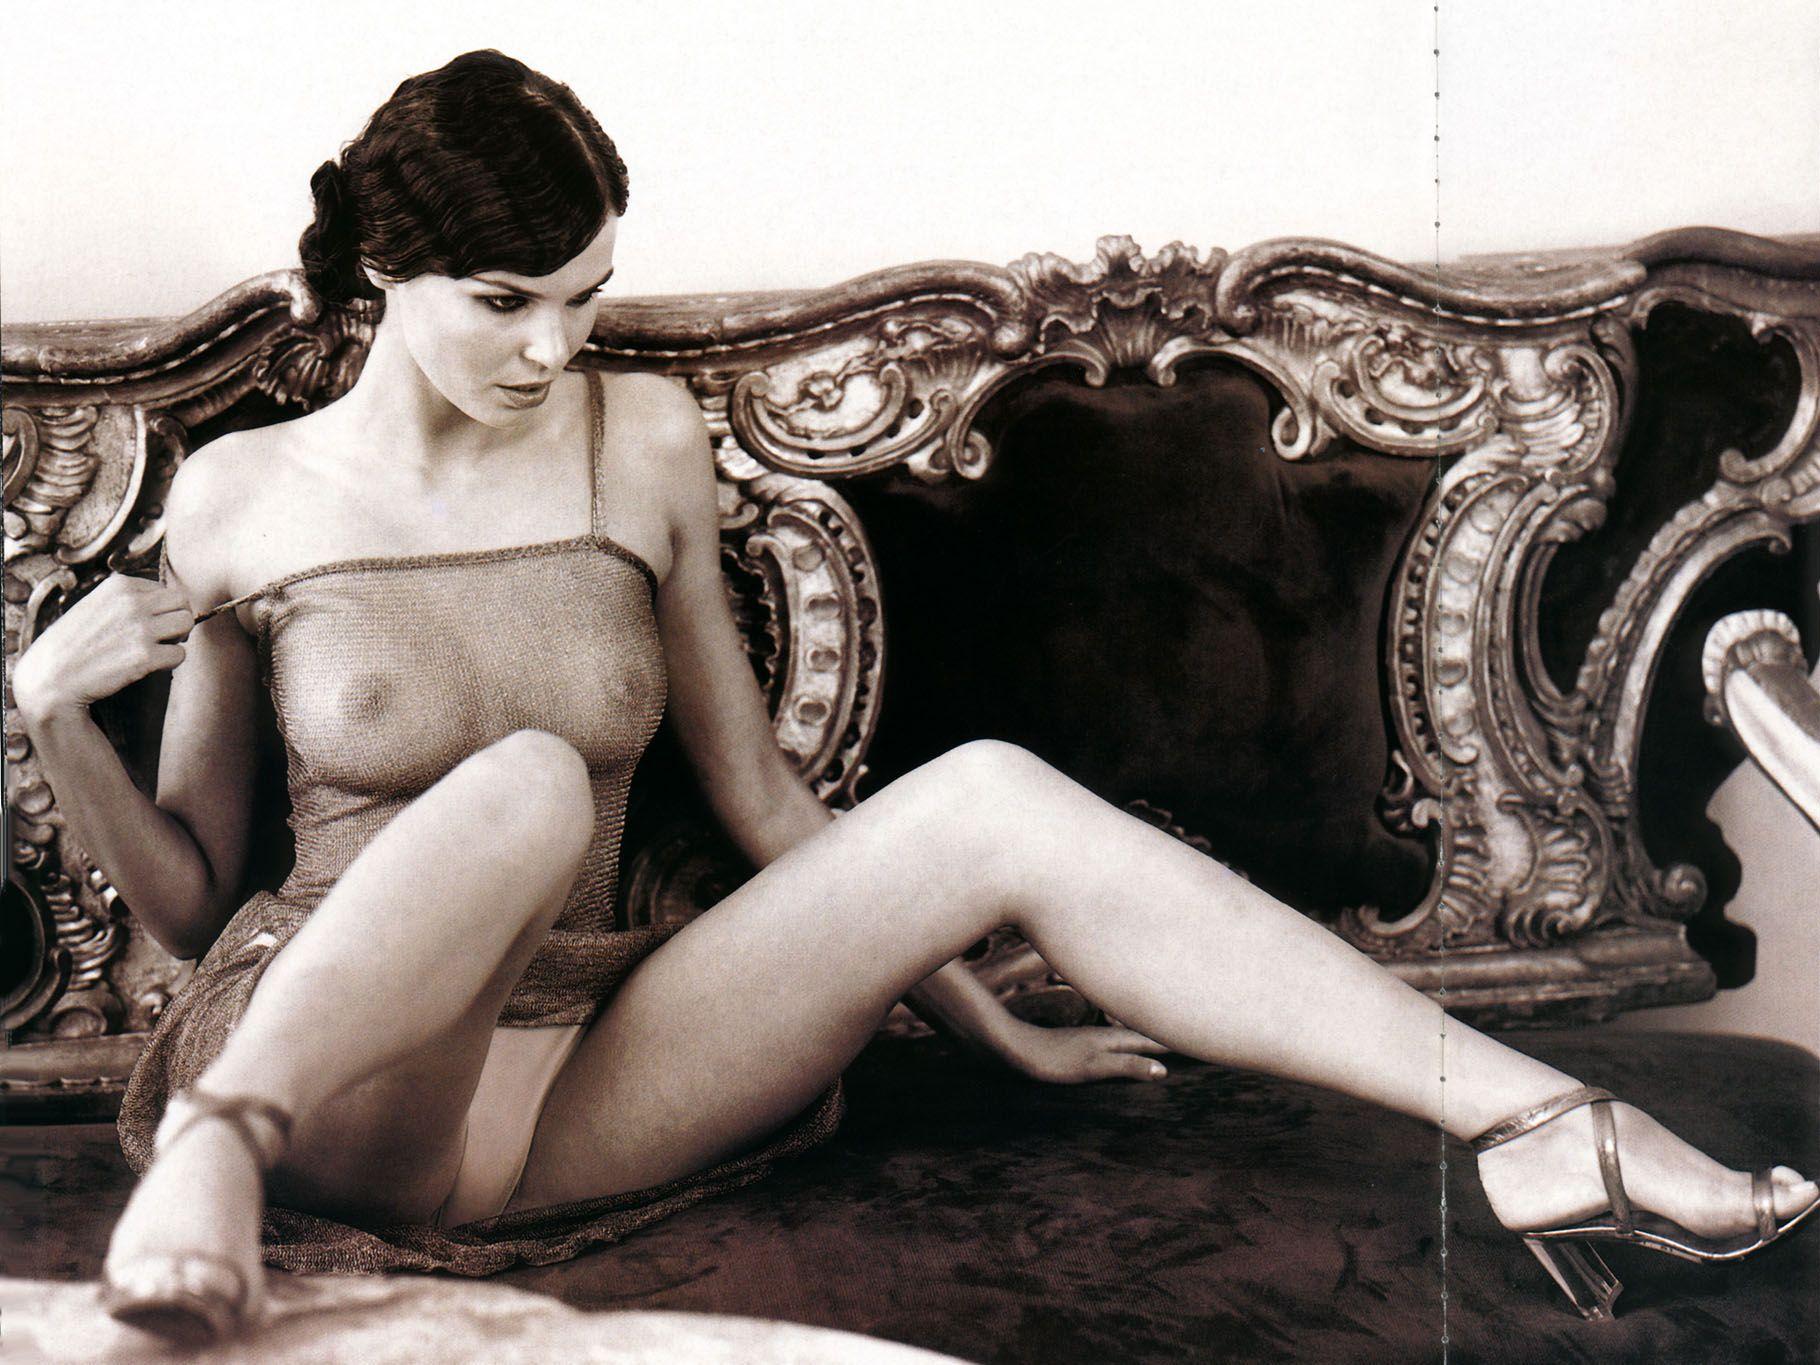 Kat Von D Nude | Renata Gabryjelska – arterotic